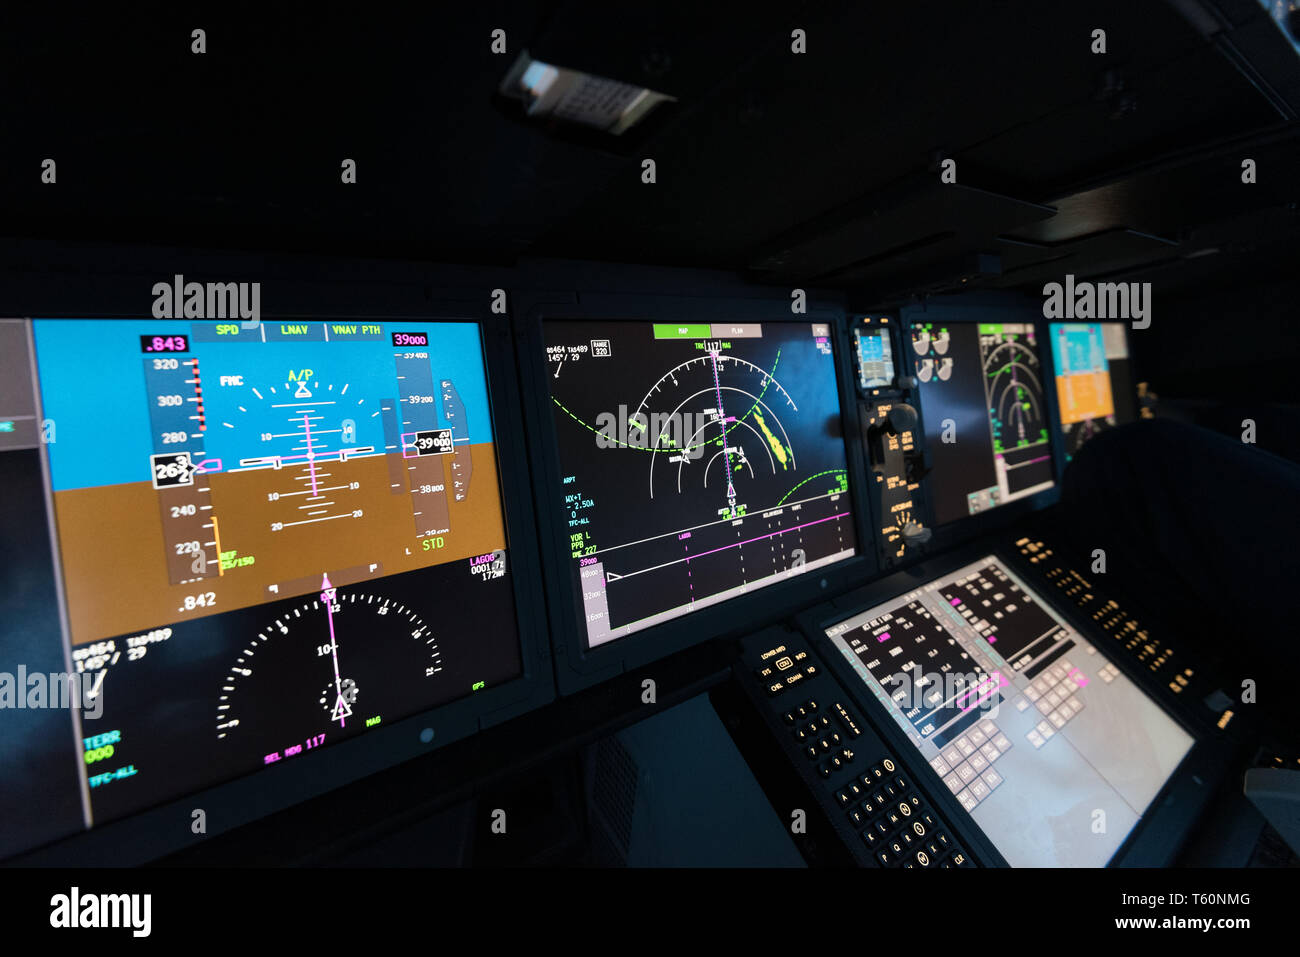 Modern aircraft flying displays - Stock Image